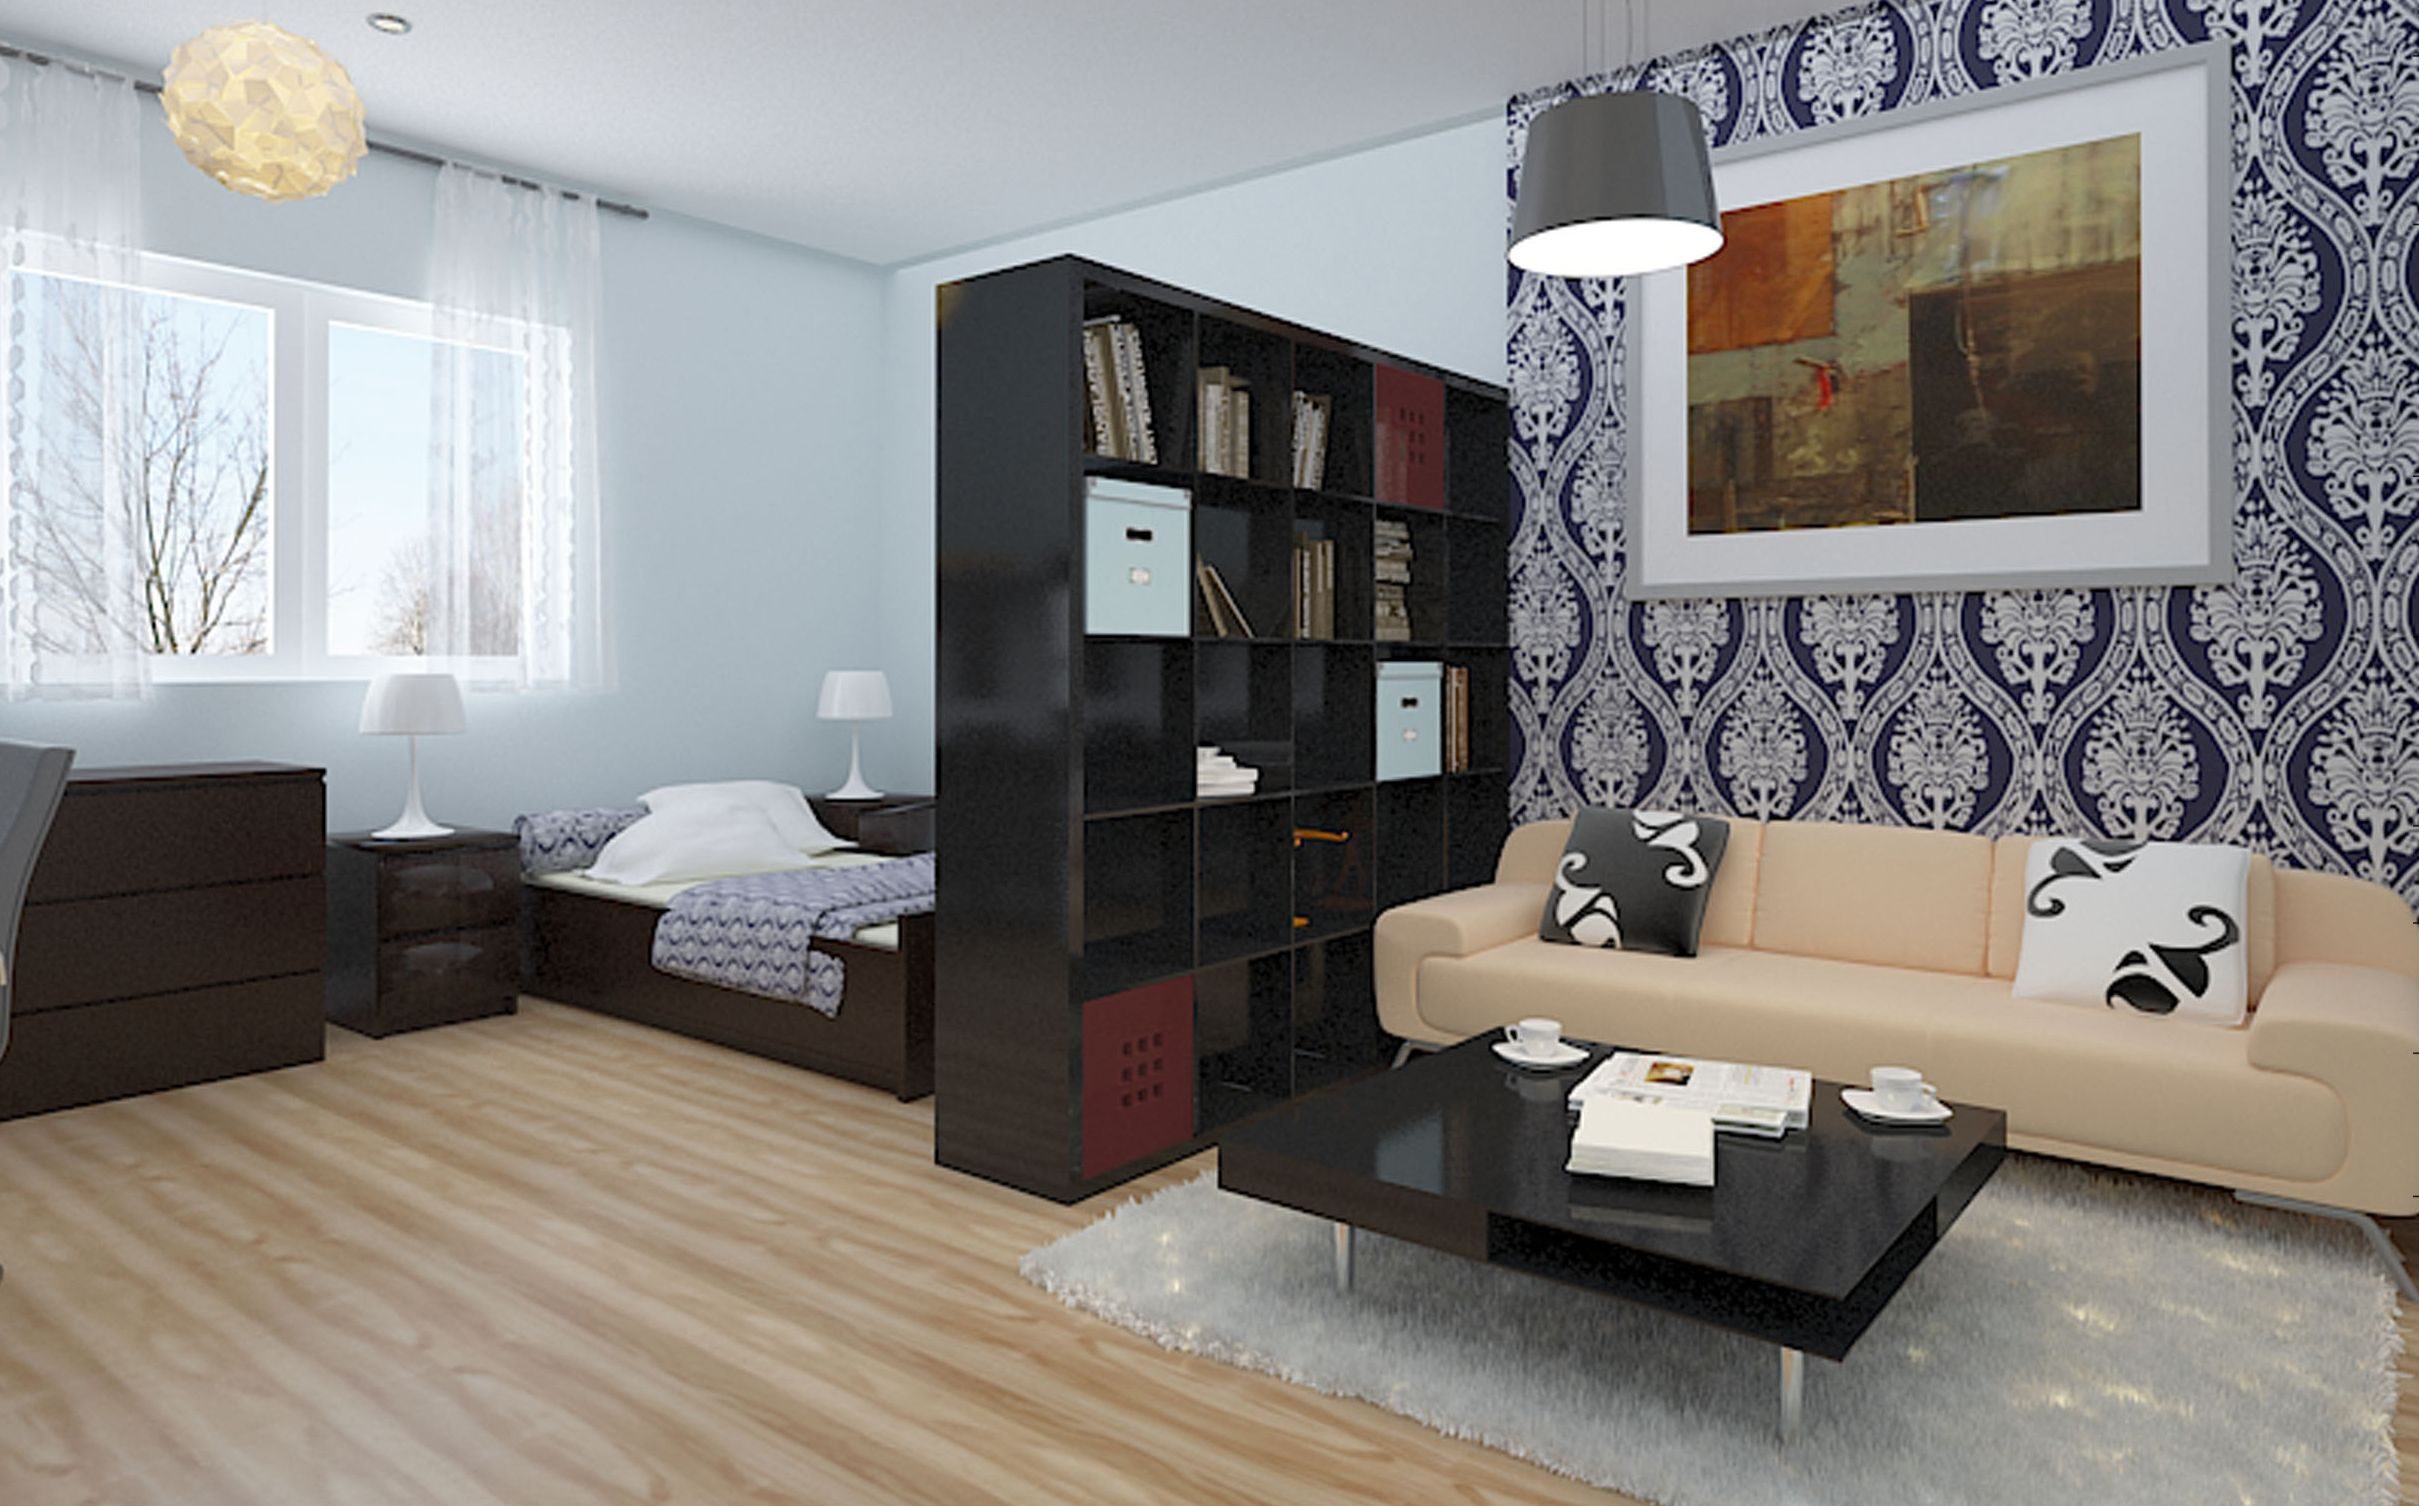 Creative Studio Apartment Design Ideas With Dark Wallpaper And Wooden Flooring Apartment Bedroom Decor Studio Apartment Decorating Apartment Interior